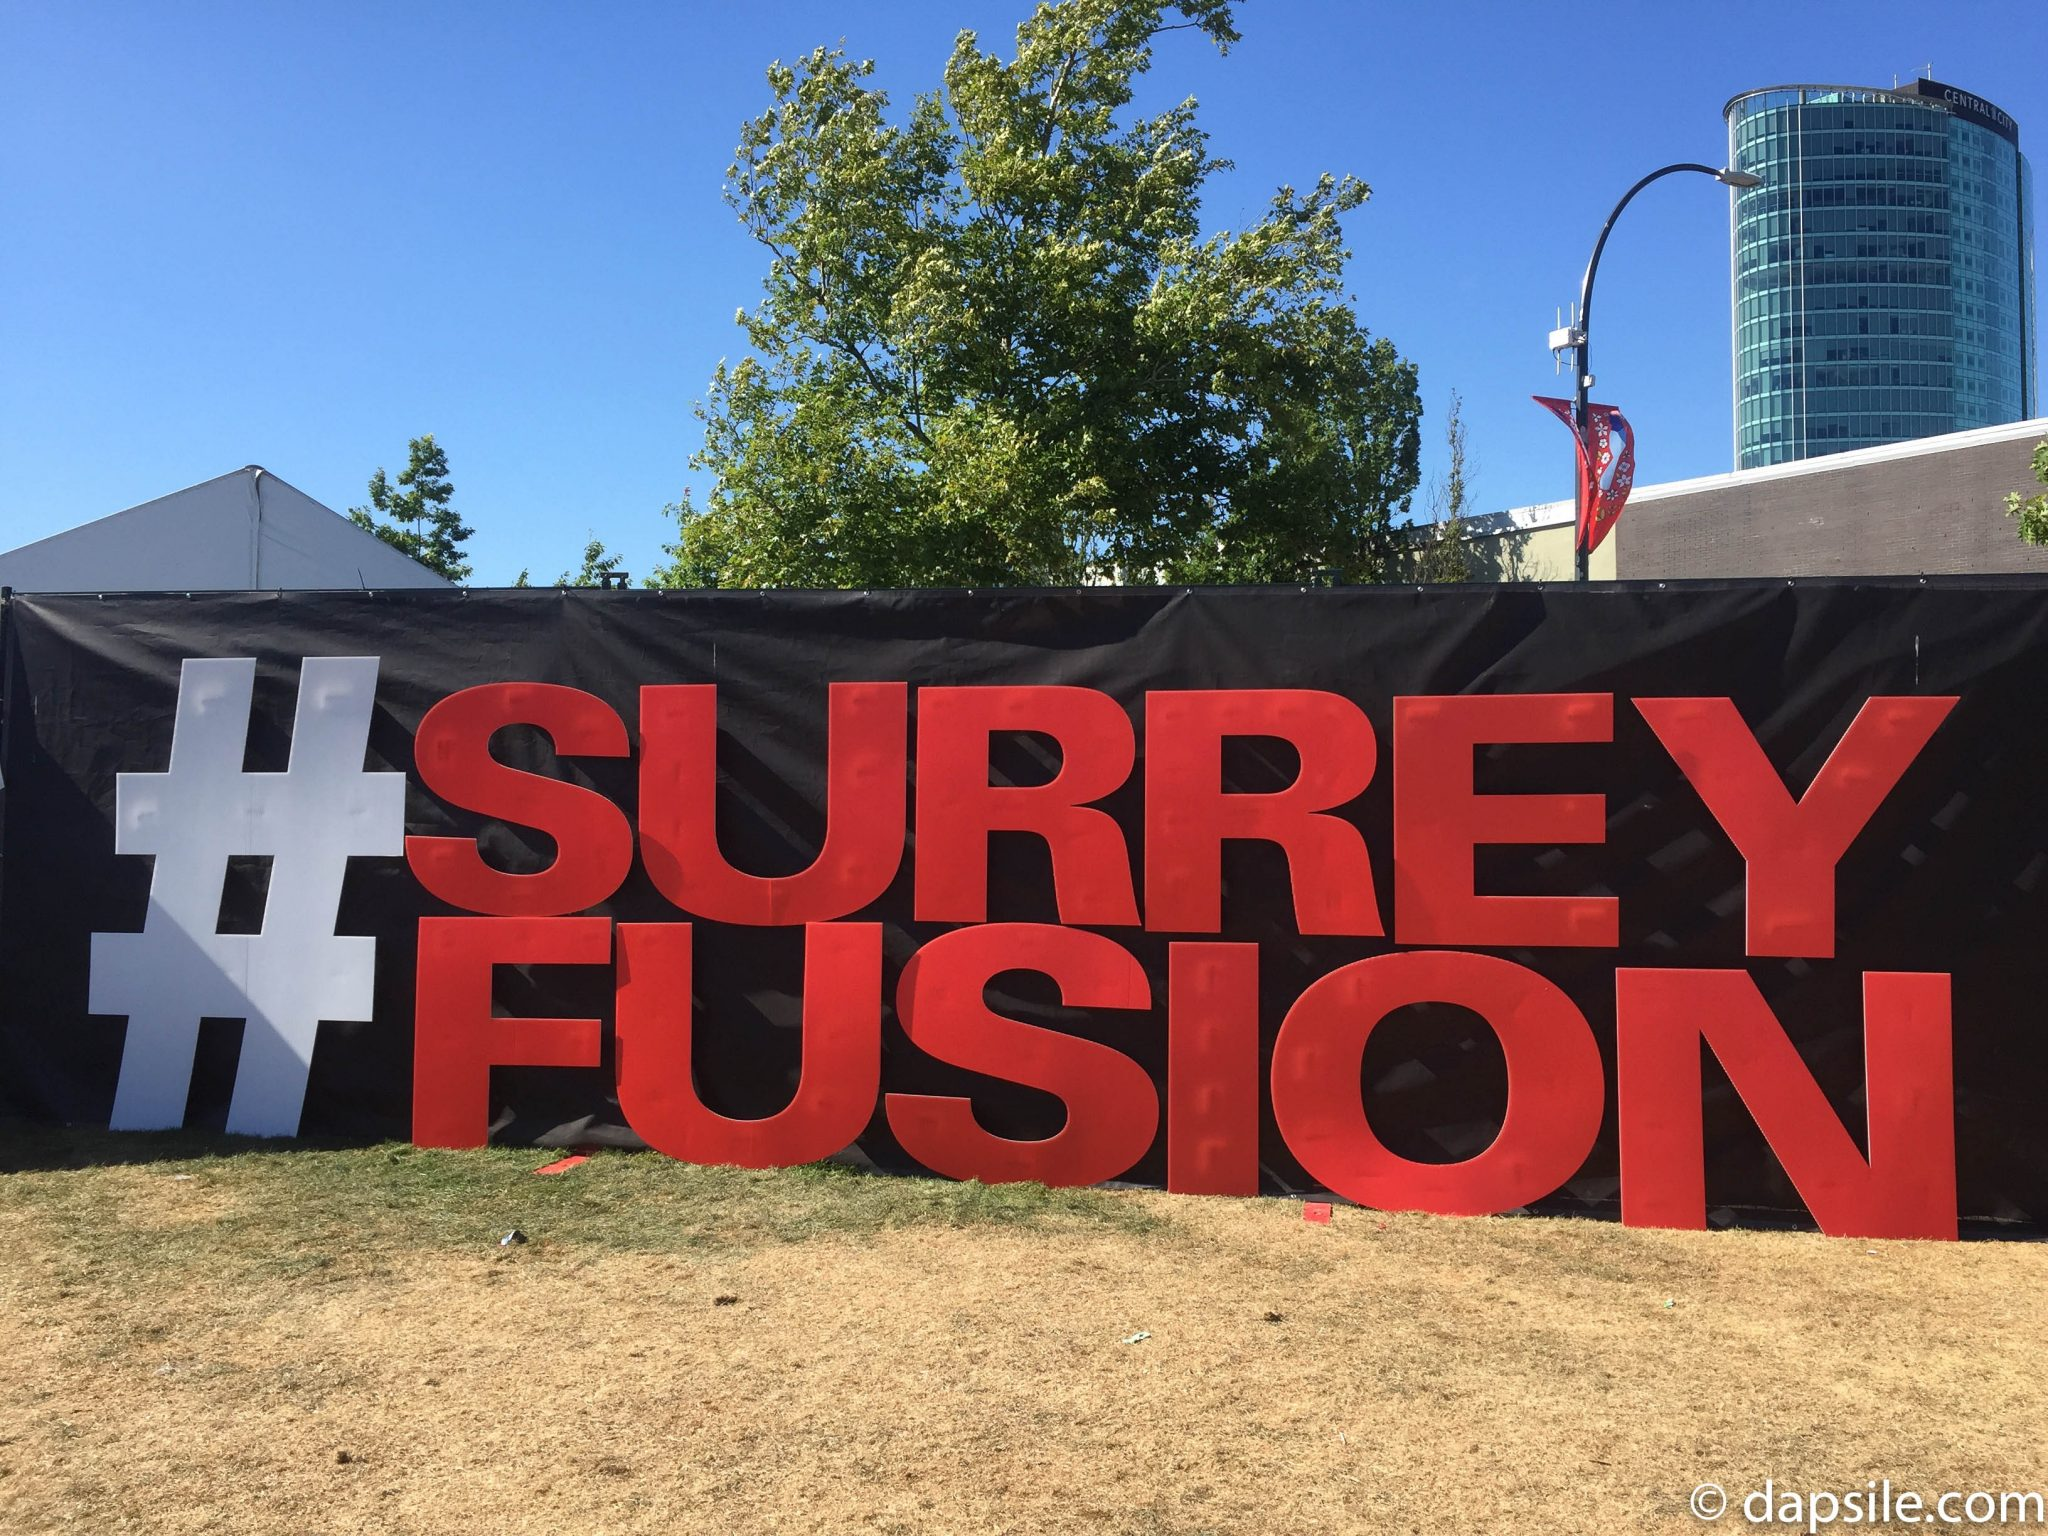 Surrey Fusion Hashtag Sign